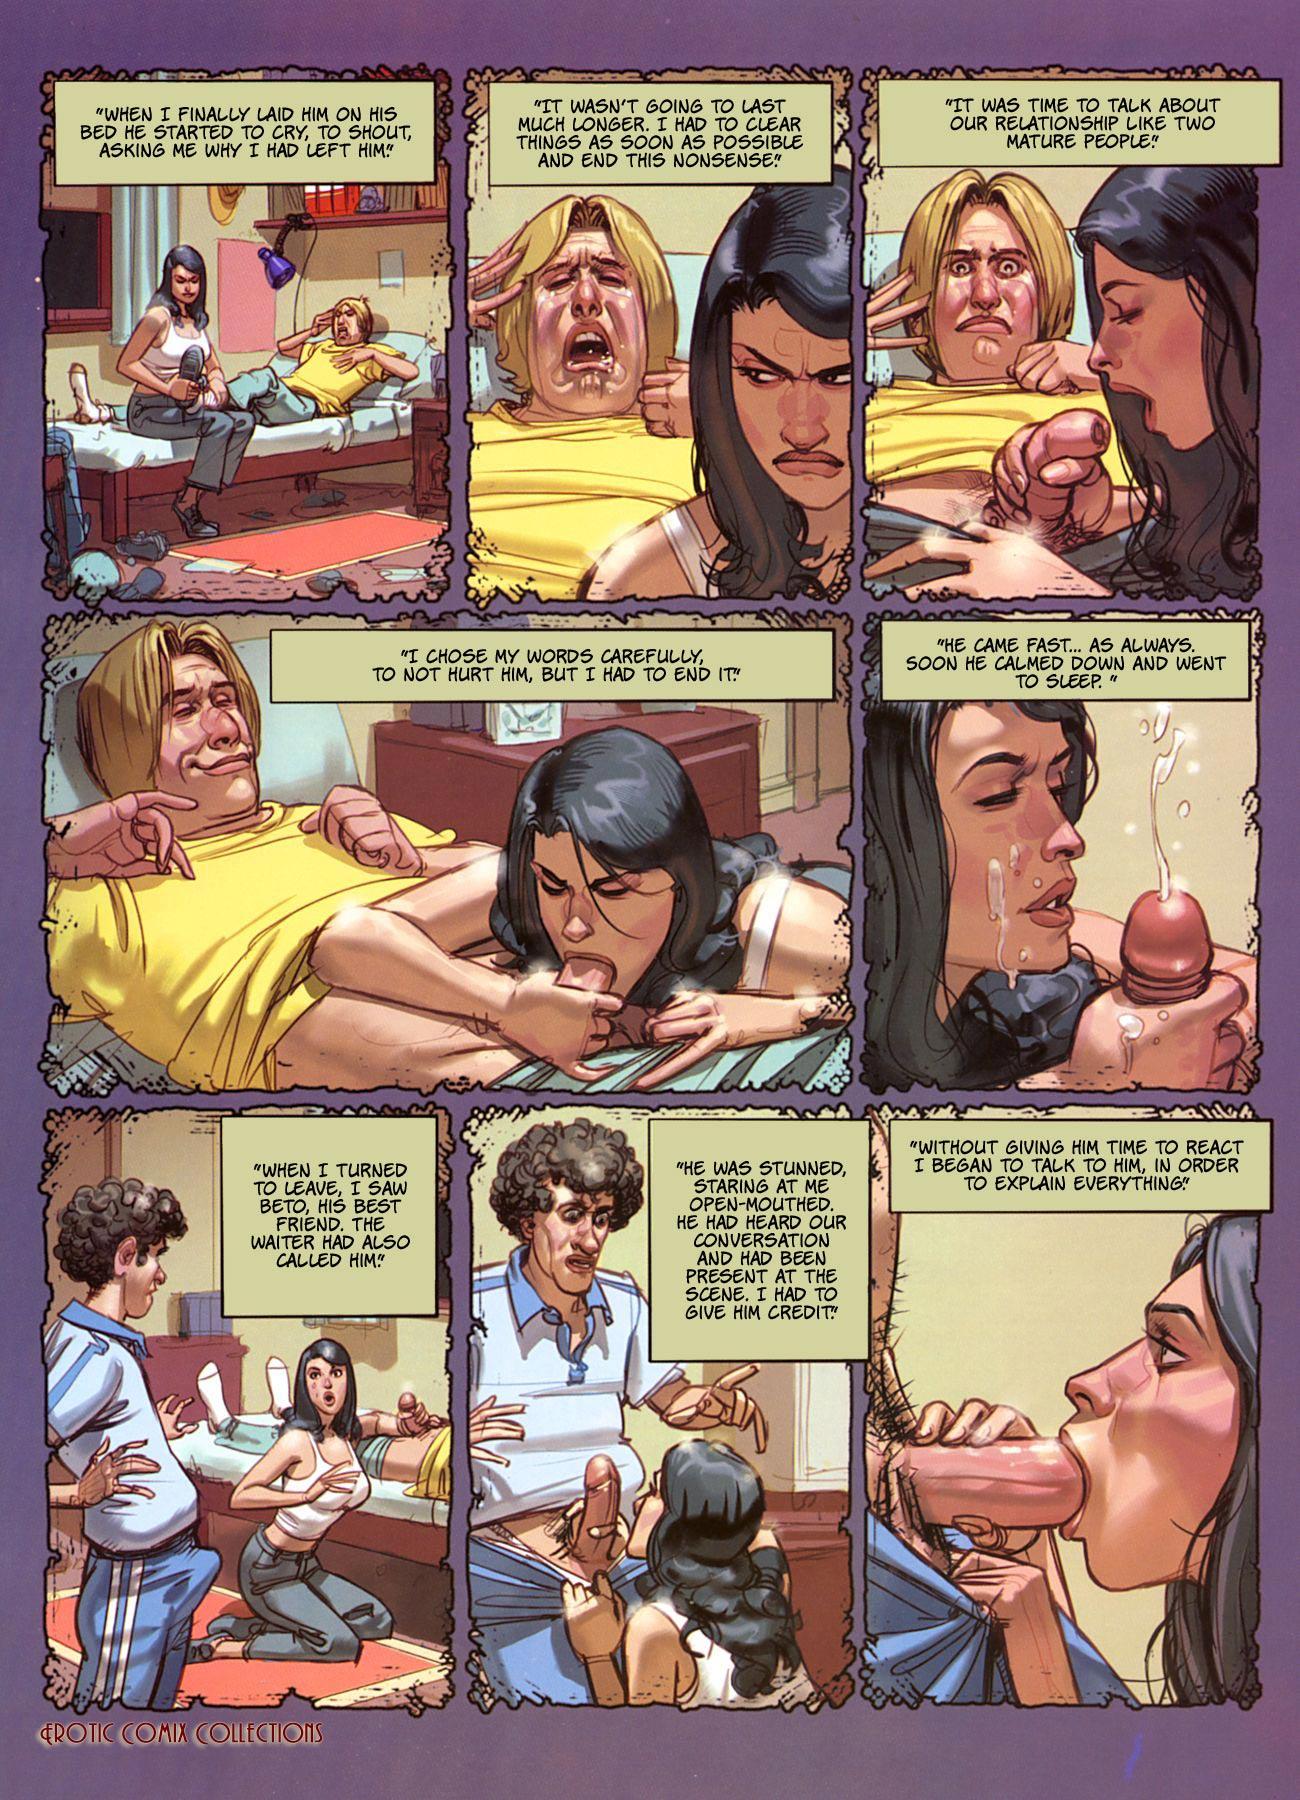 Sapphic erotic stories-2485